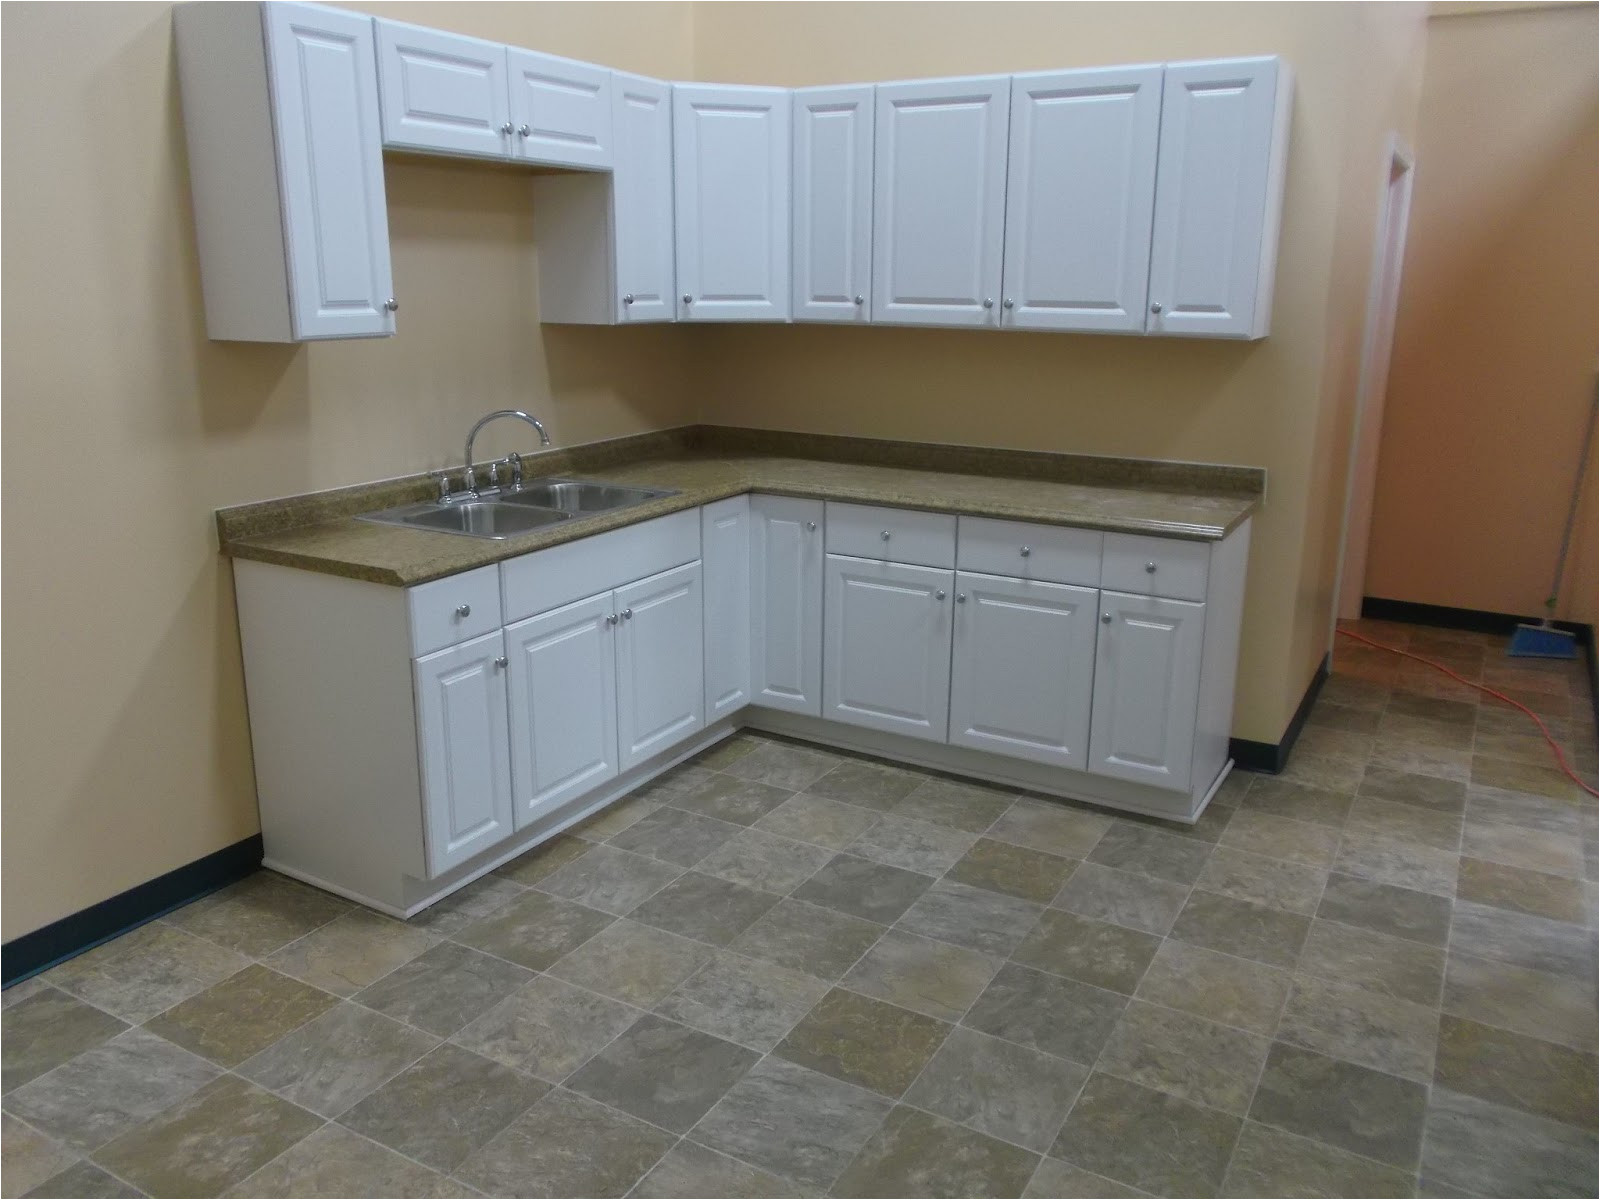 break room kitchen u00bb dream home enterprises llc hampton bay kitchen cabinets installation guide hampton bay